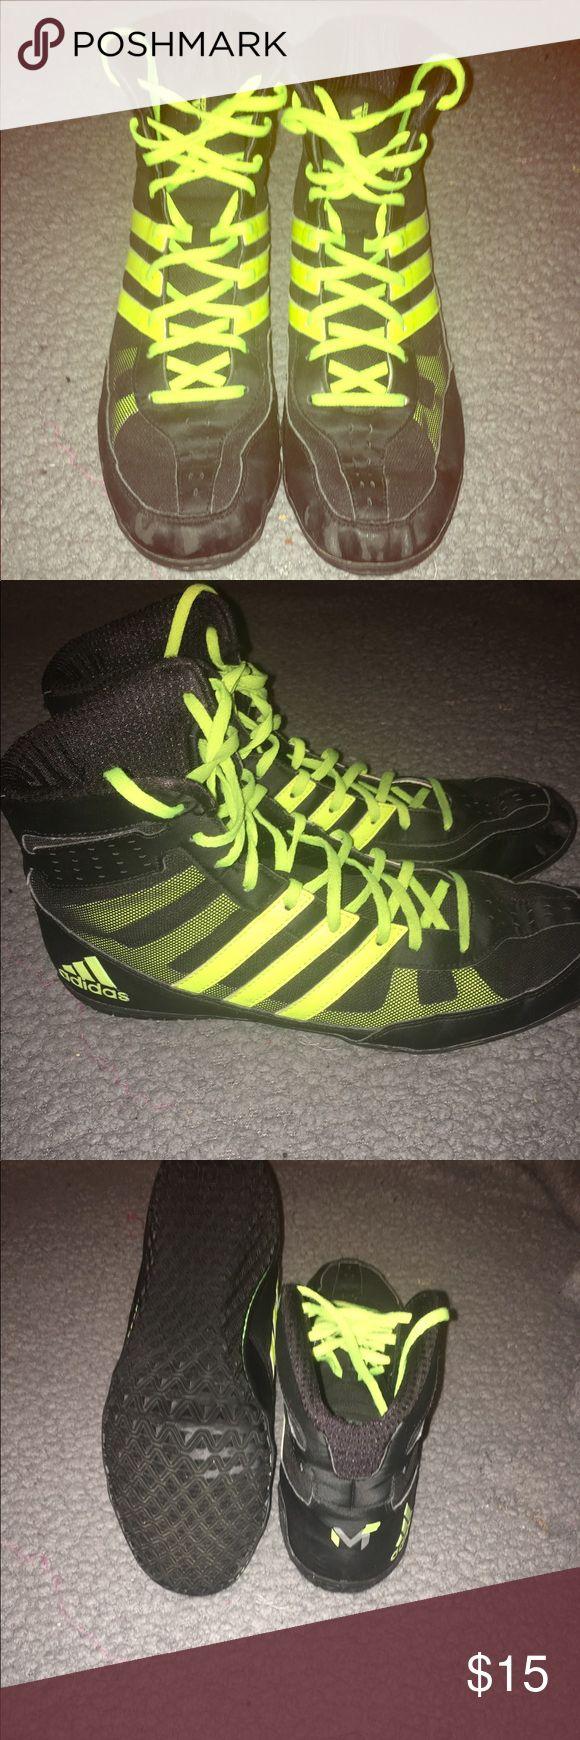 Wrestling shoes Men's wrestling / boxing shoes adidas Shoes Athletic Shoes